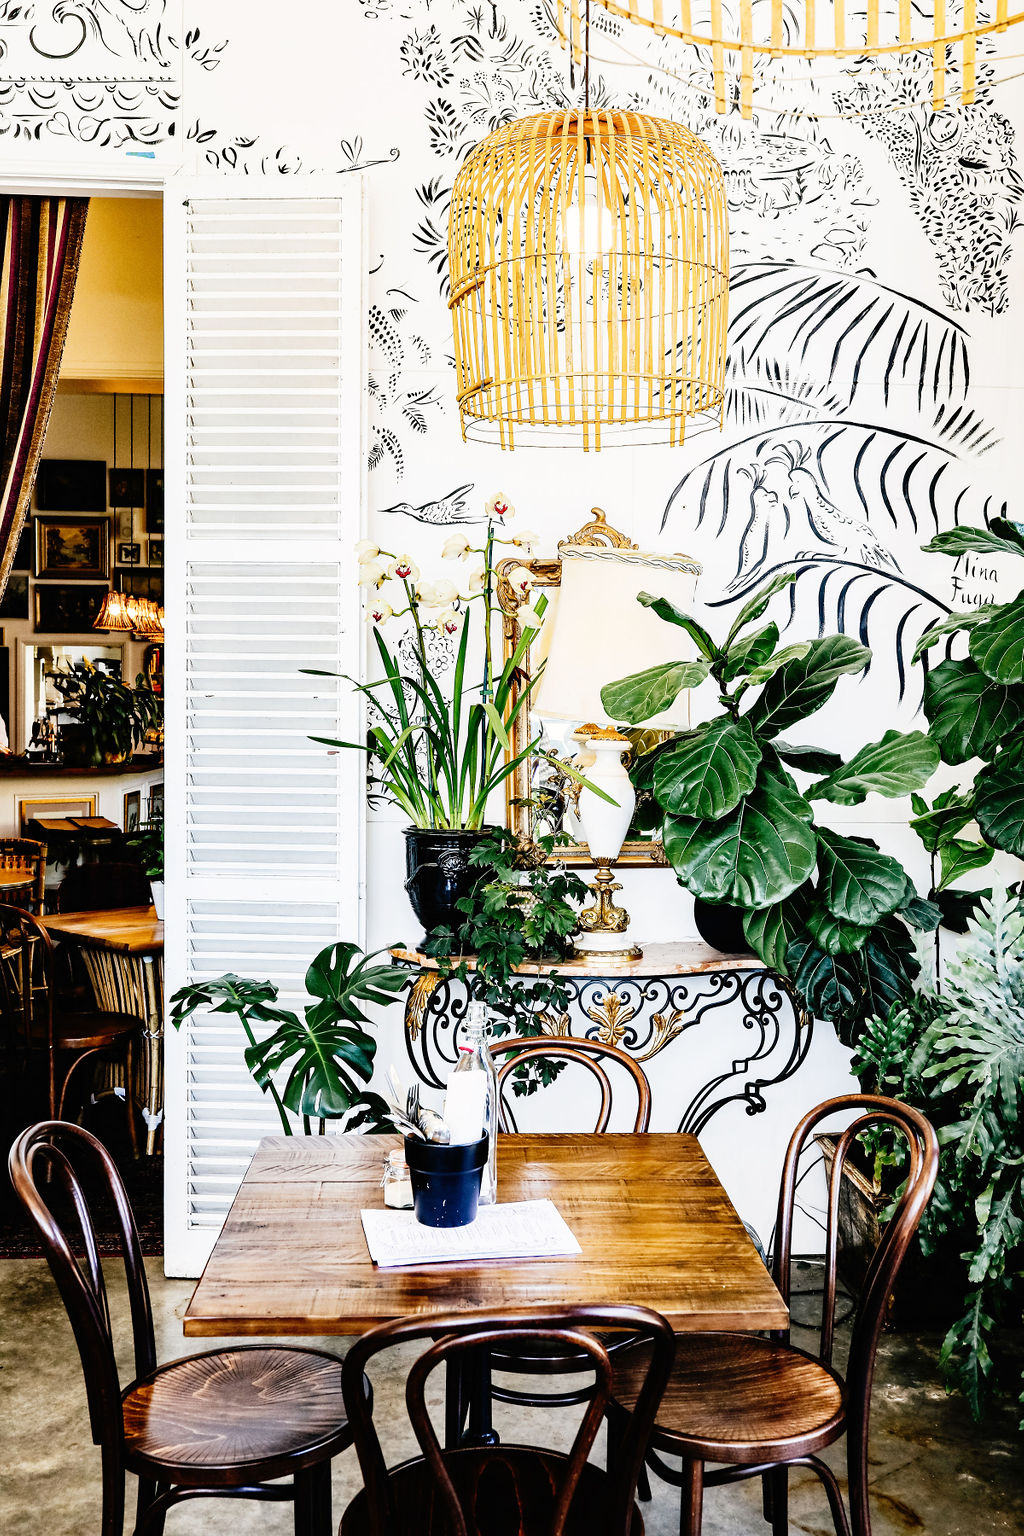 Plantation Cafe Bowral | Green Lane Bowral